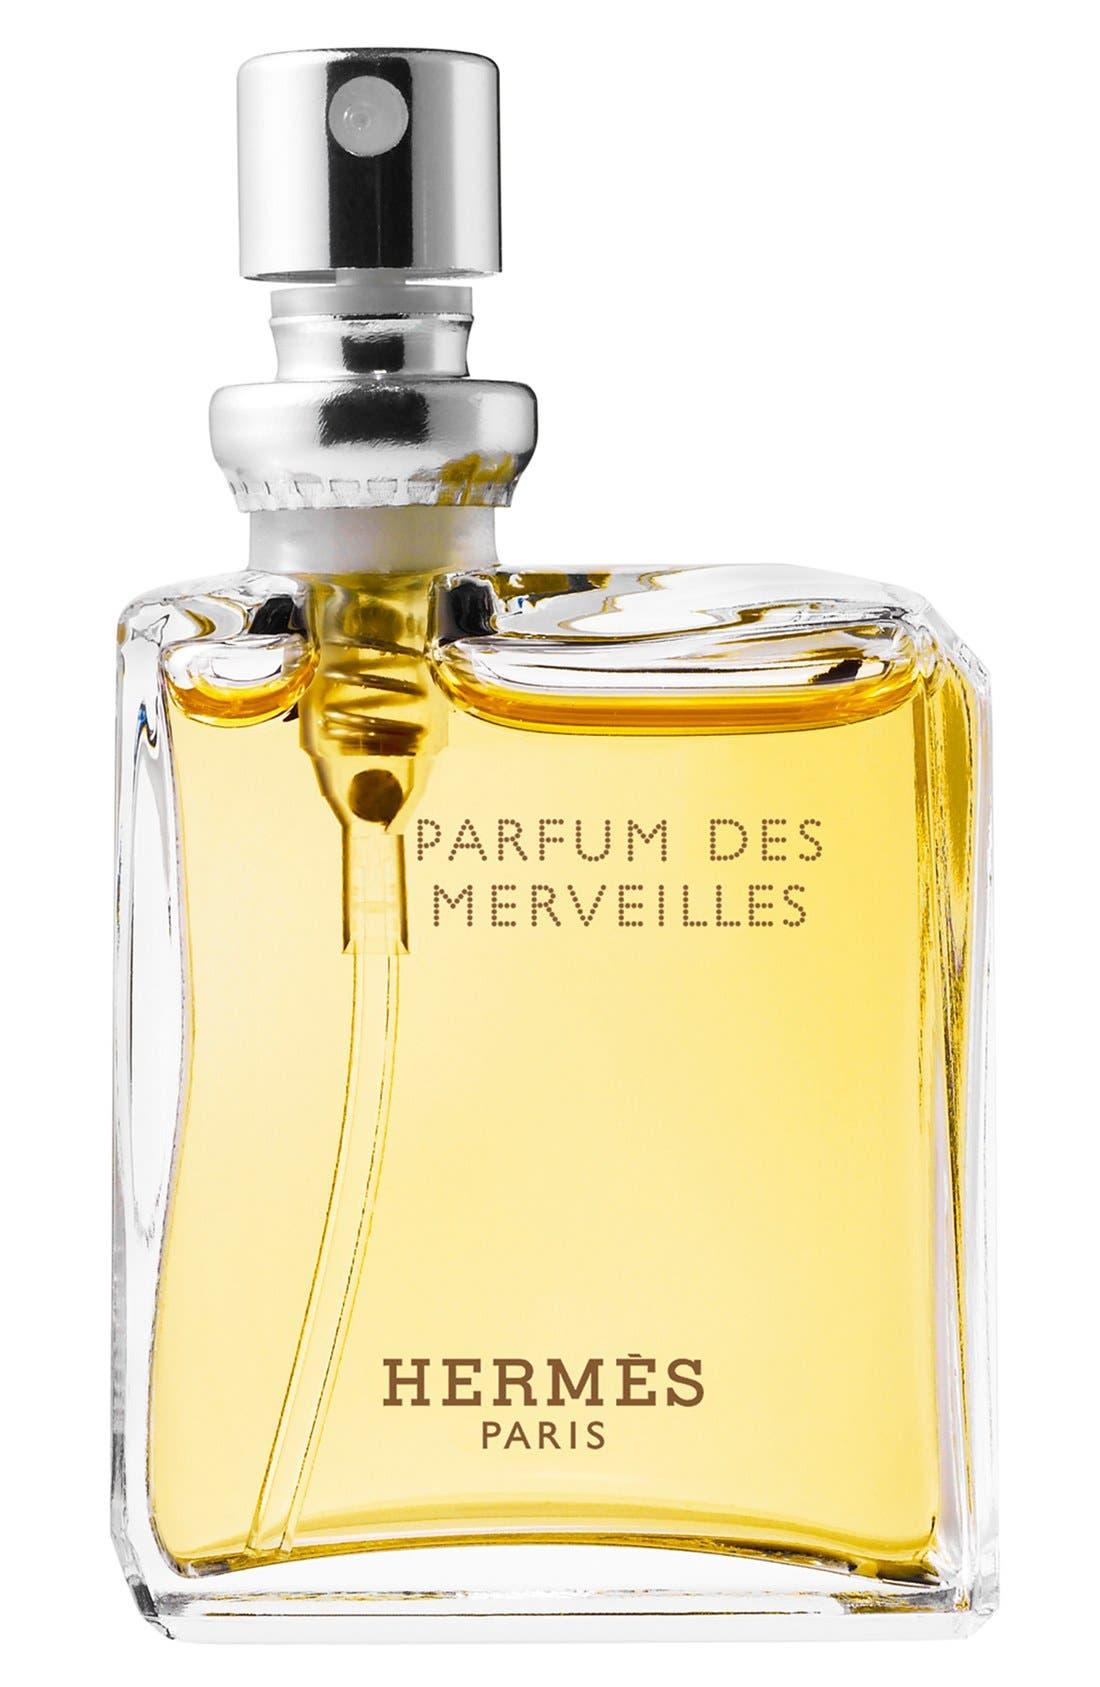 Eau des Merveilles Parfum des Merveilles - Pure perfume lock spray refill,                             Main thumbnail 1, color,                             NO COLOR